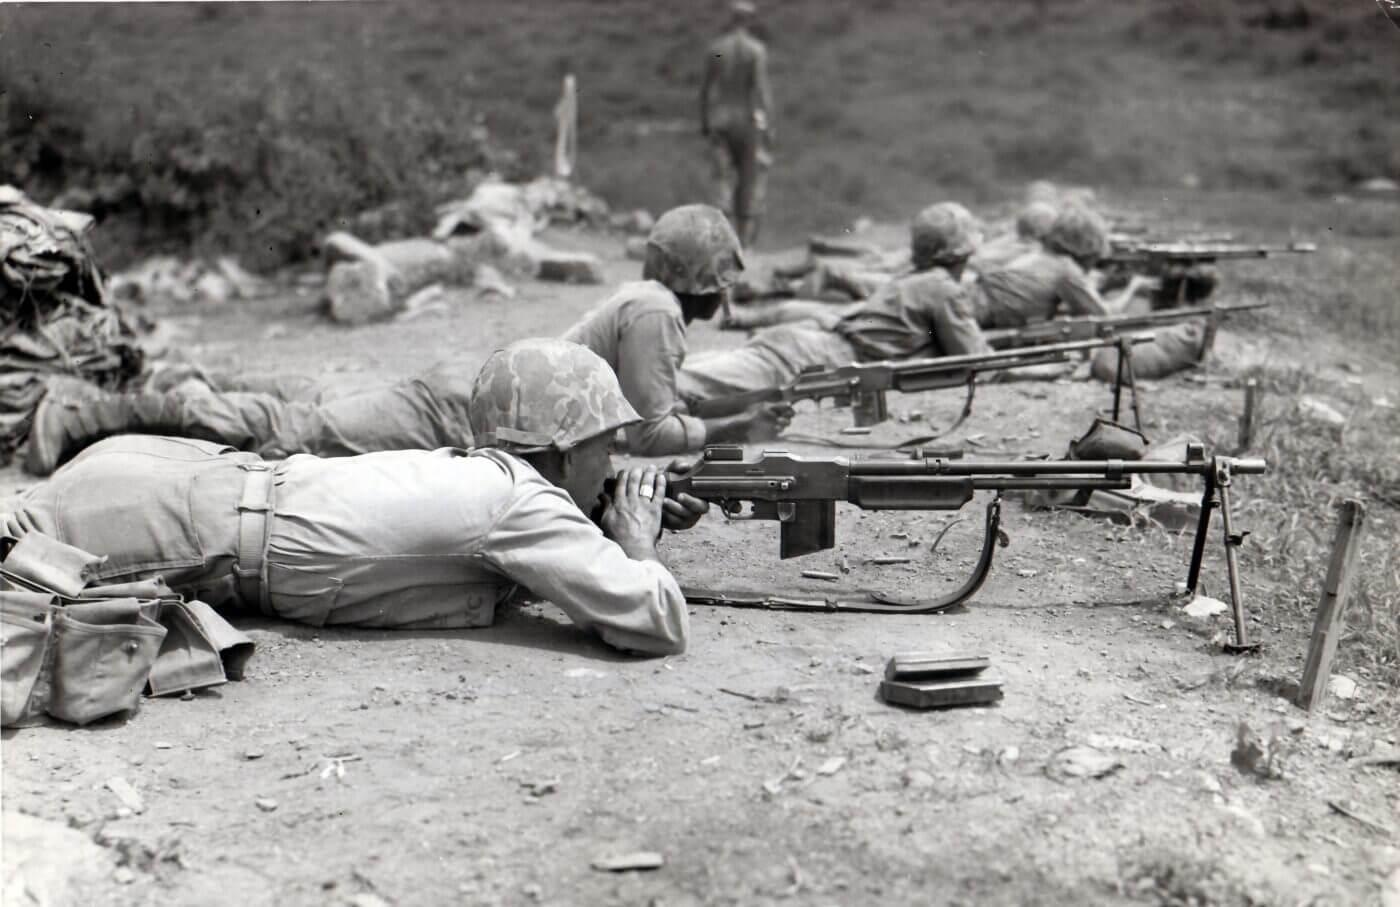 BAR rifle training in Korea circa 1952